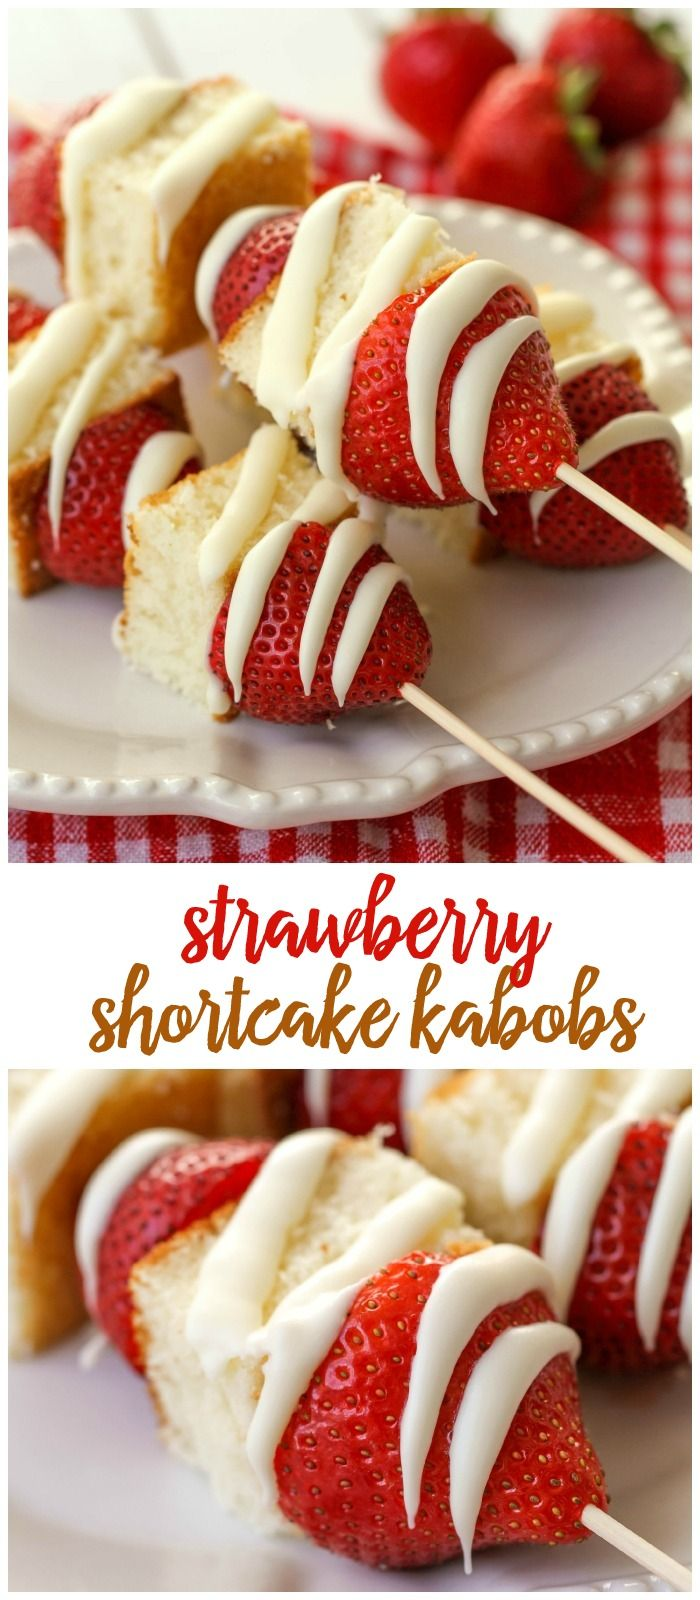 Strawberry Sponge Cake Dessert